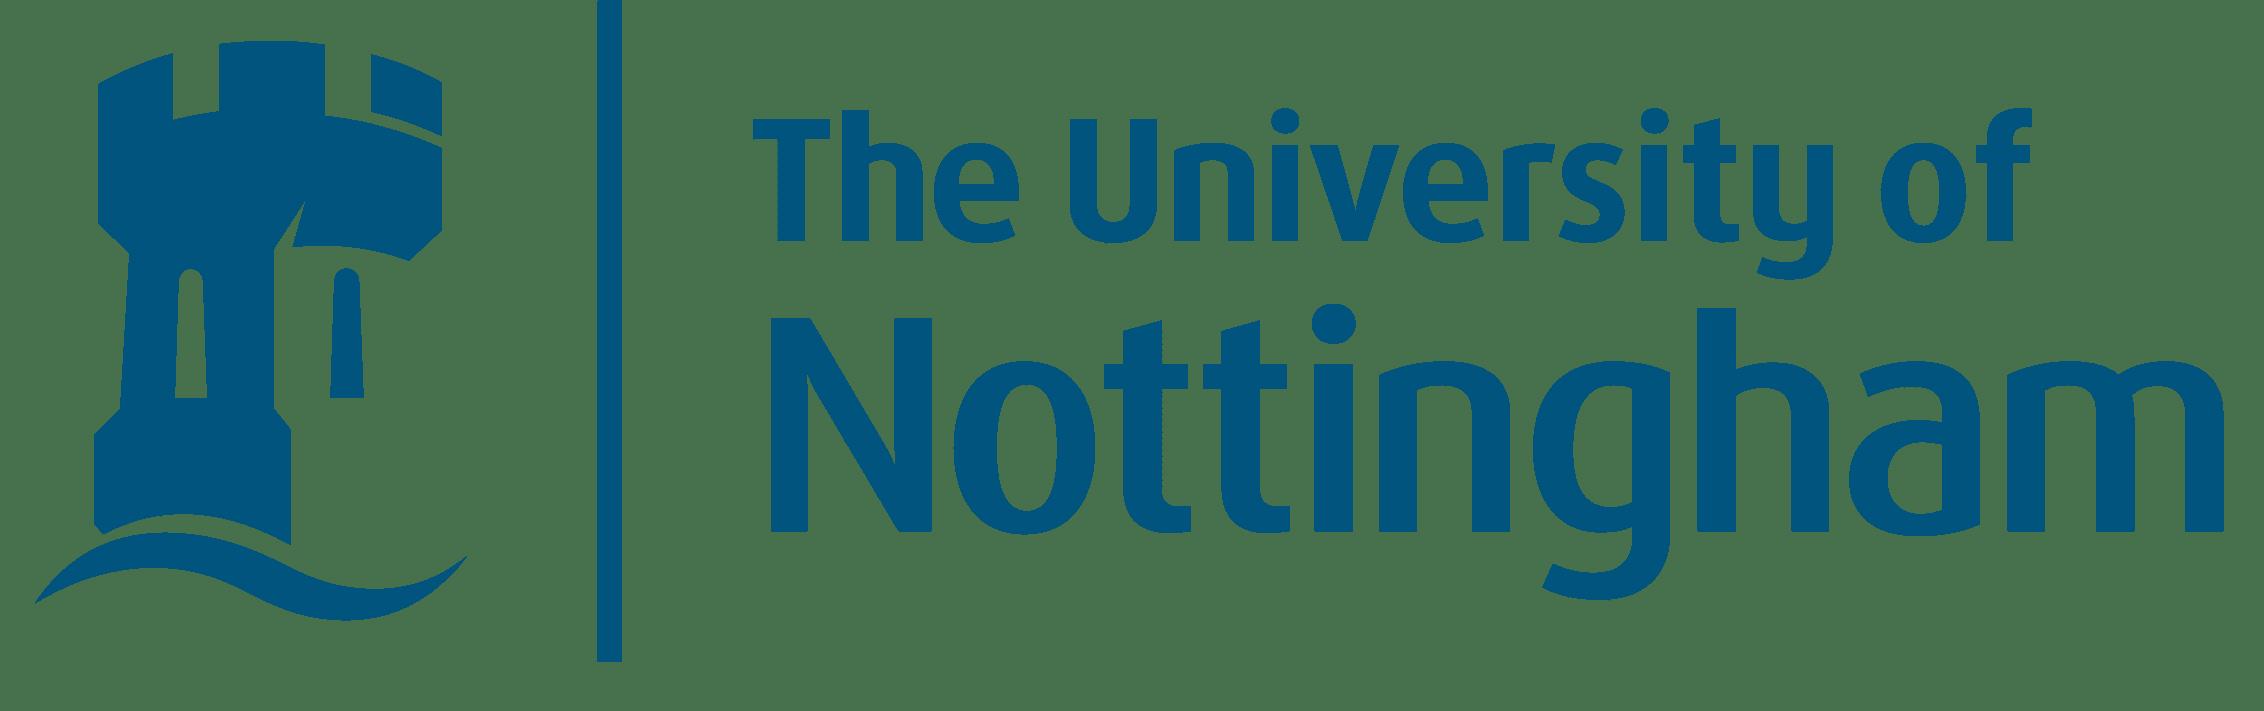 University of Nottingham